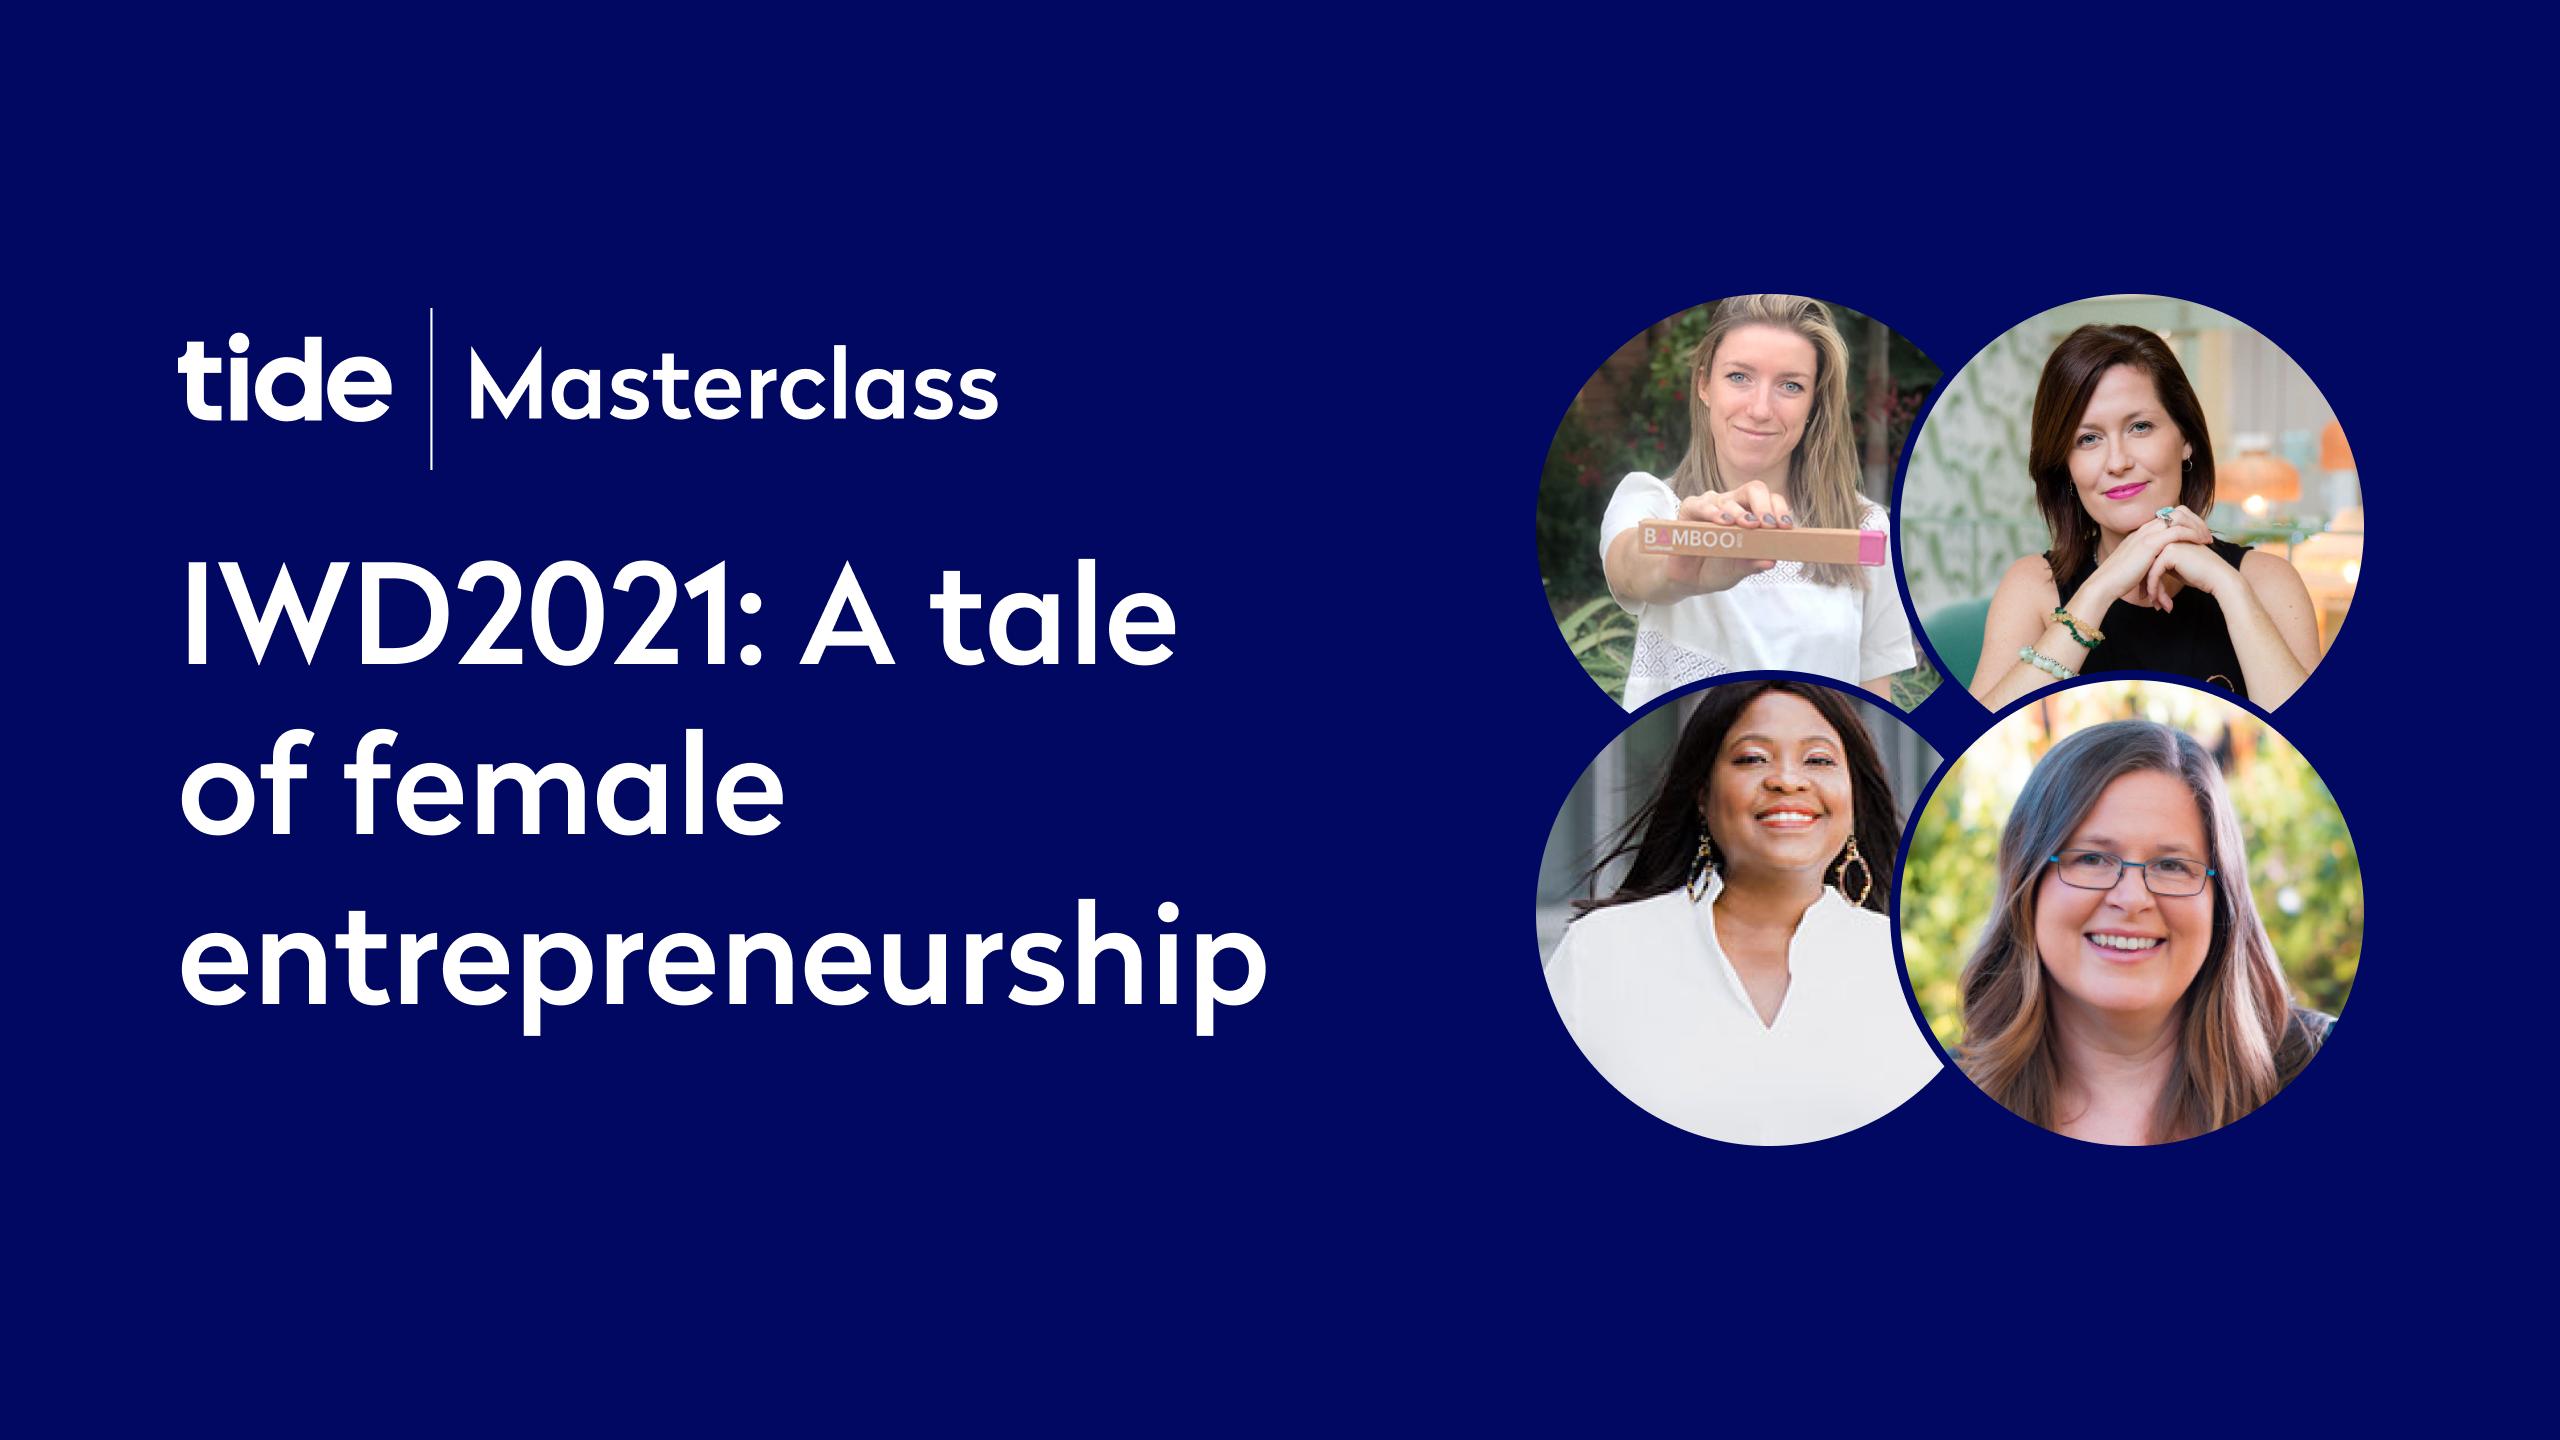 Listen again: IWD2021: A tale of female entrepreneurship (Tide Masterclass)